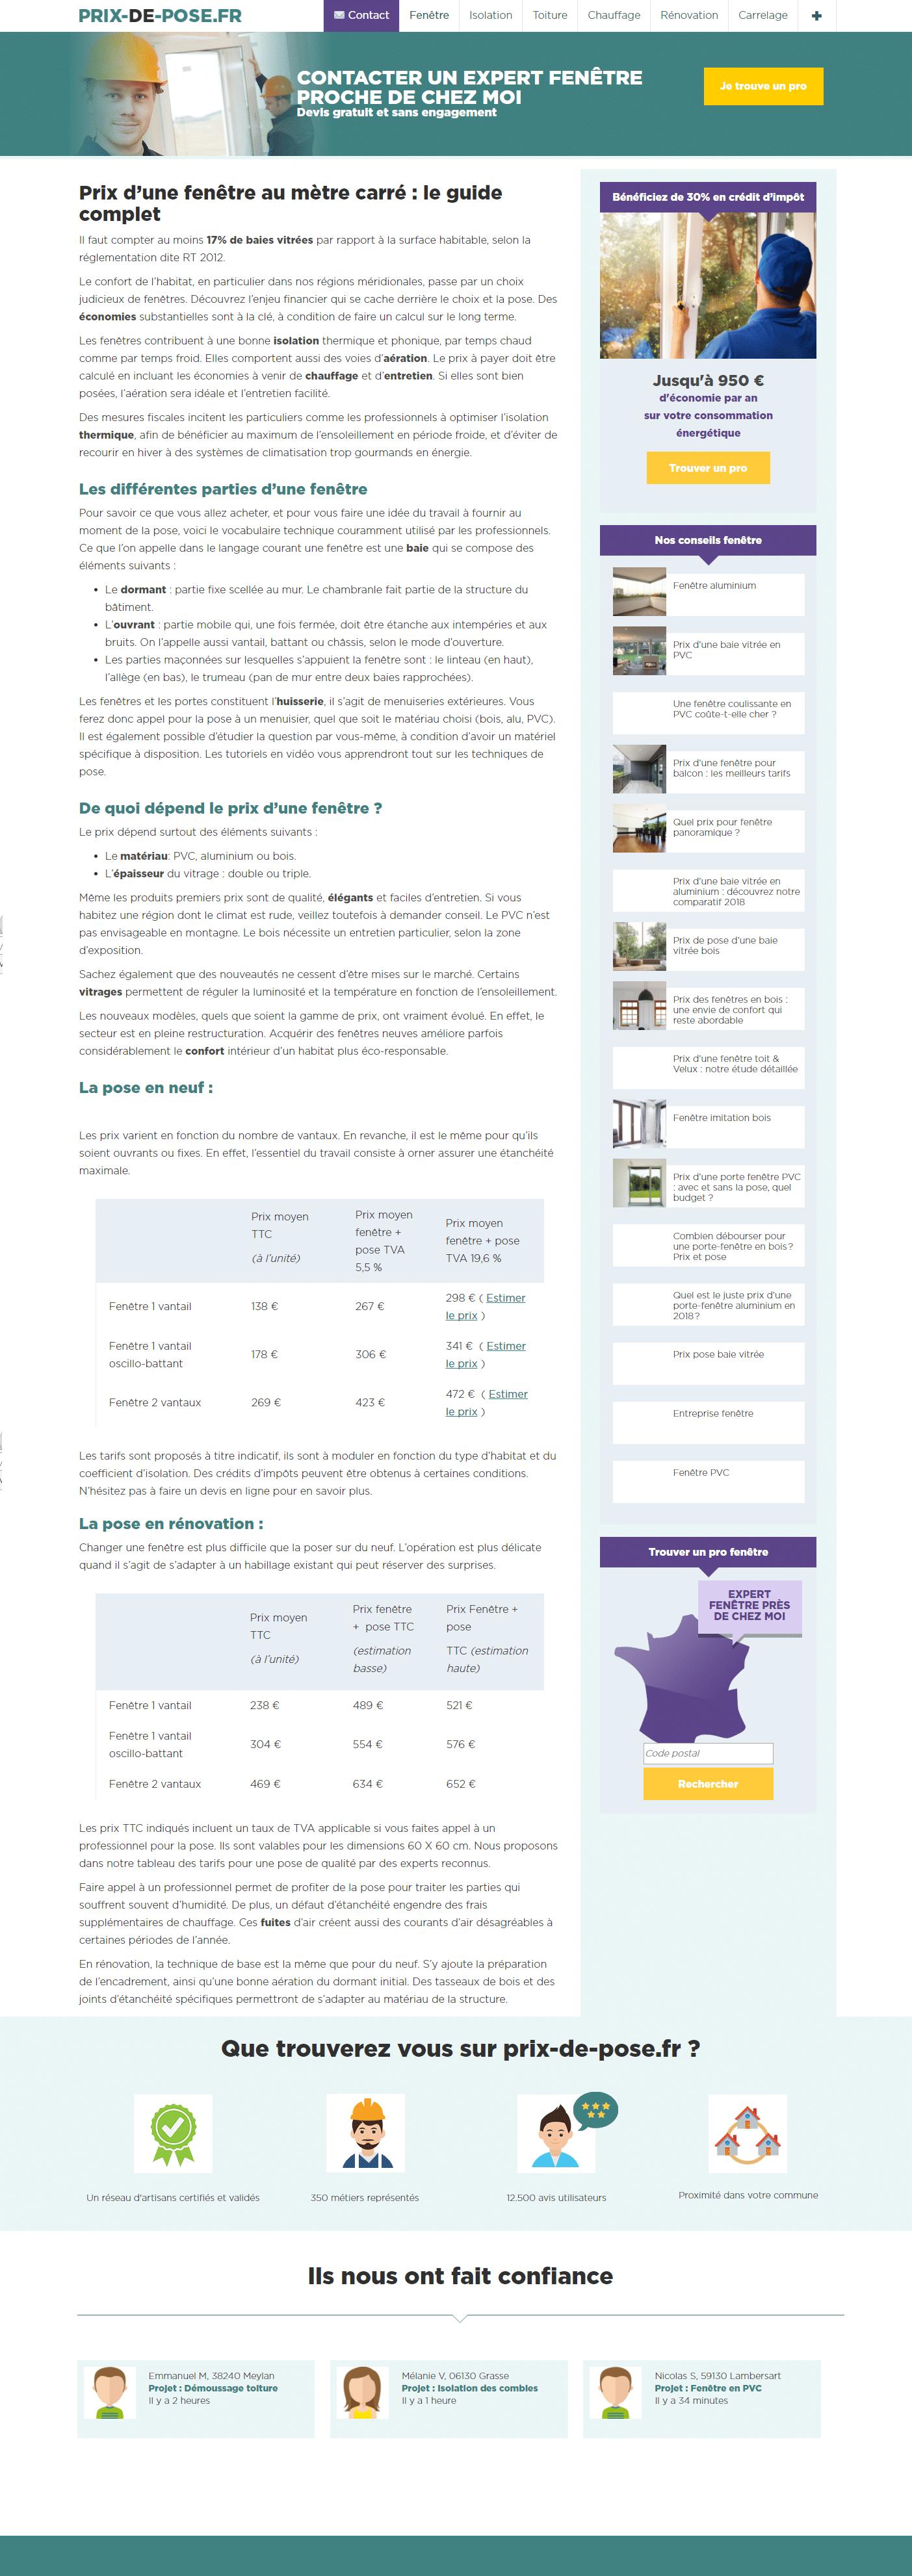 Prixdepose.fr - Webdesigner freelance, 10 années d'expertise